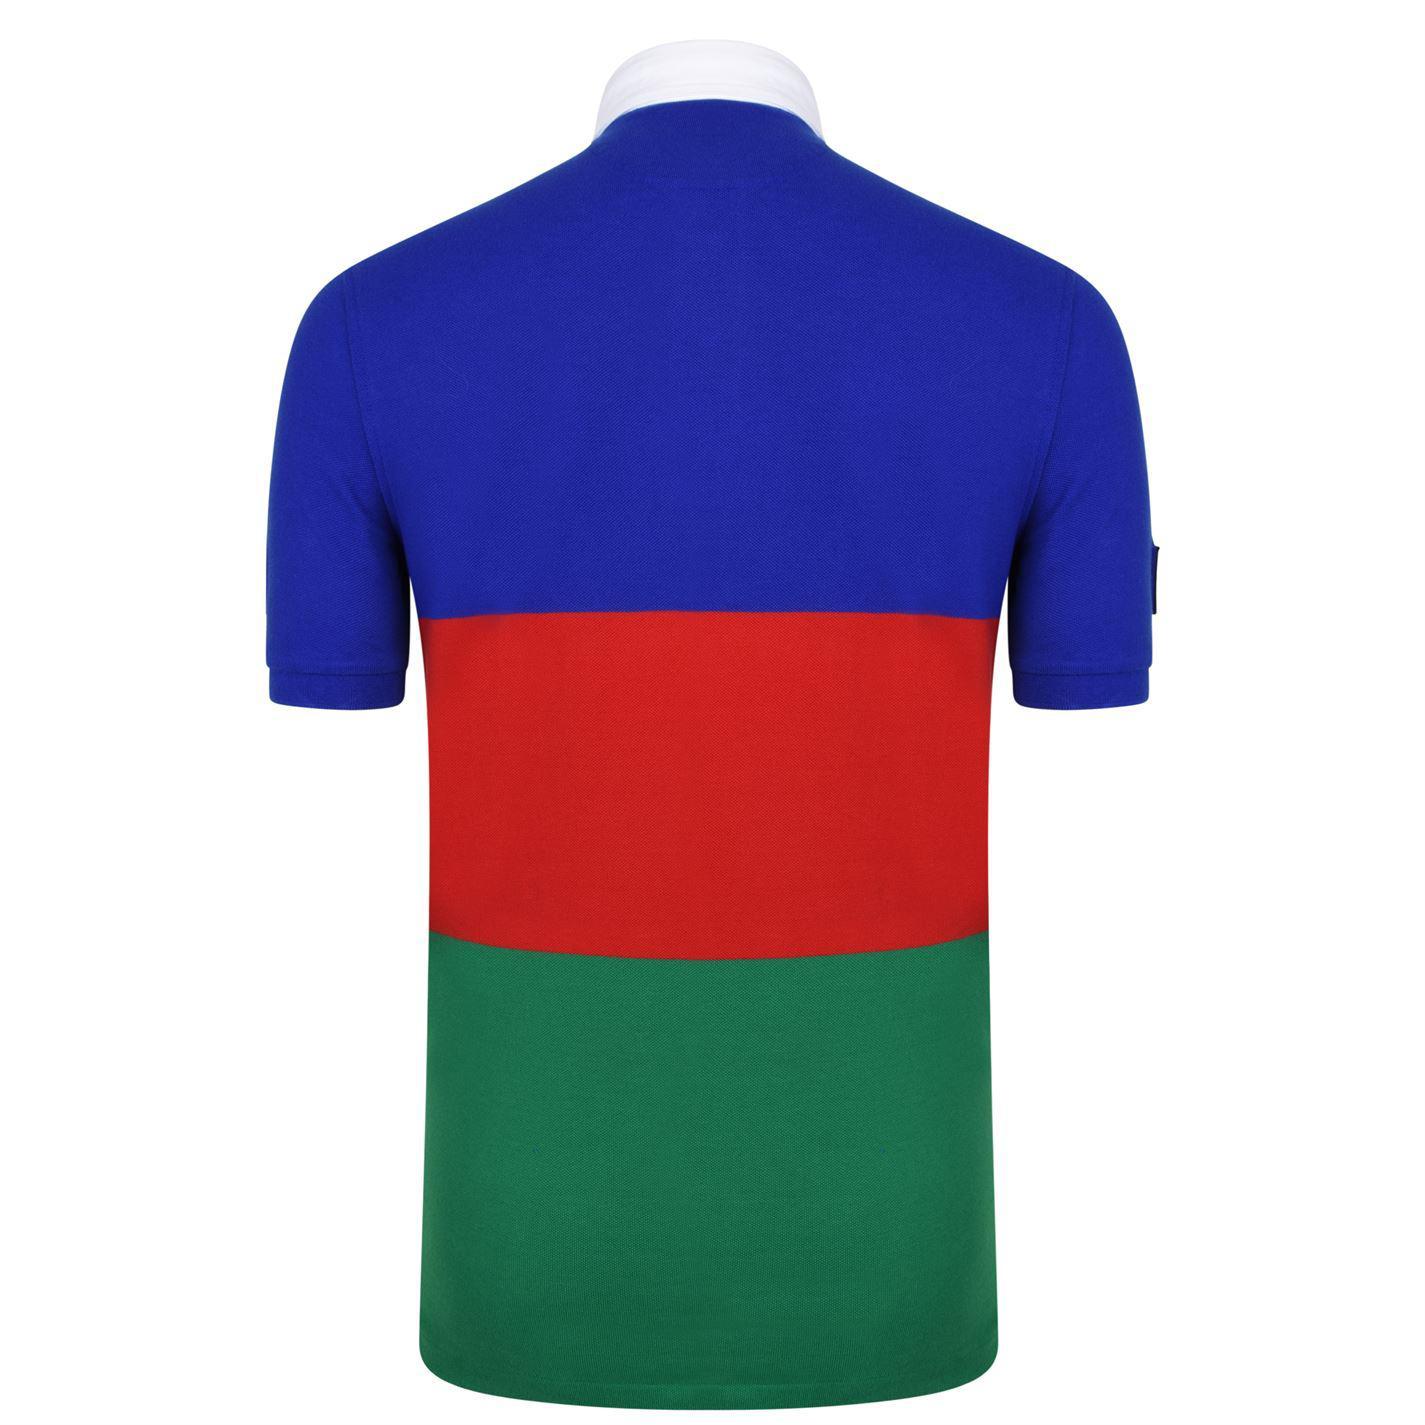 ab5663e3053 Polo Ralph Lauren Hi Tech Rafting Polo Shirt for Men - Lyst